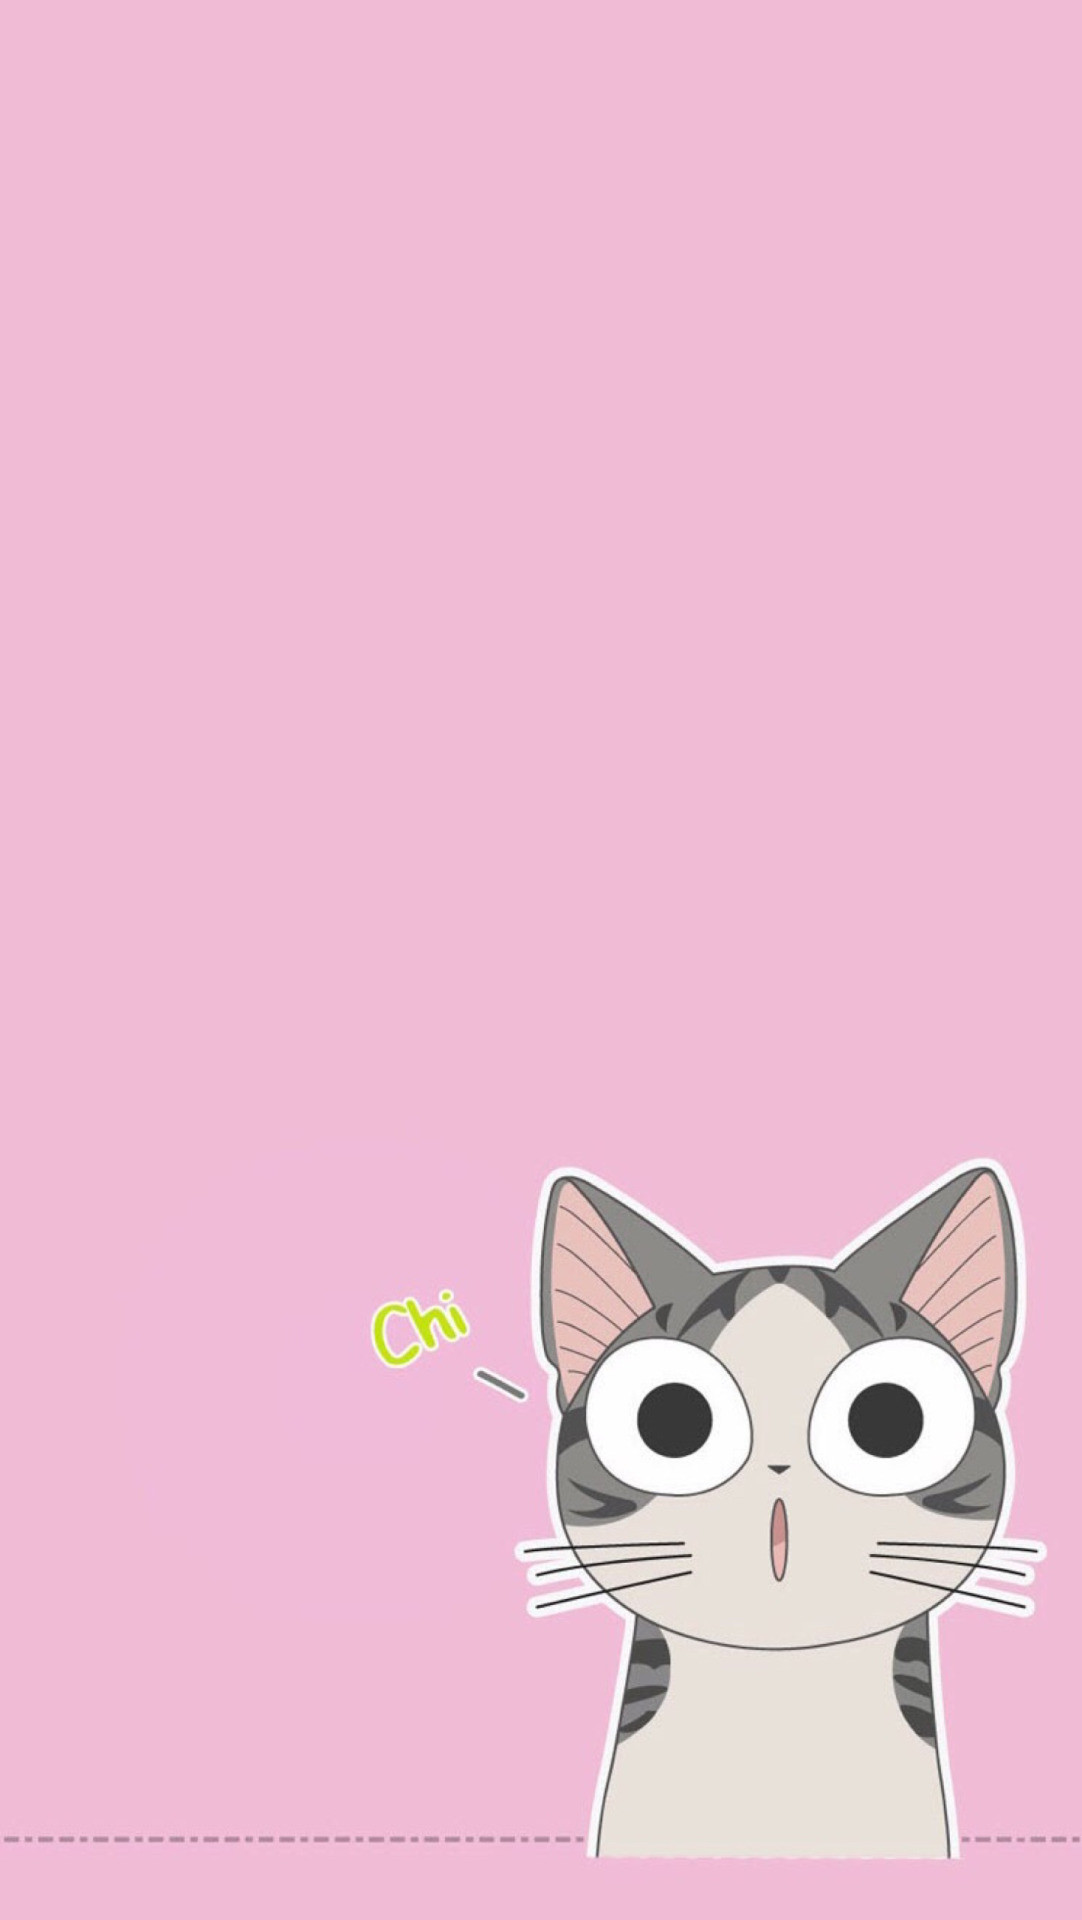 53 Pusheen The Cat Iphone